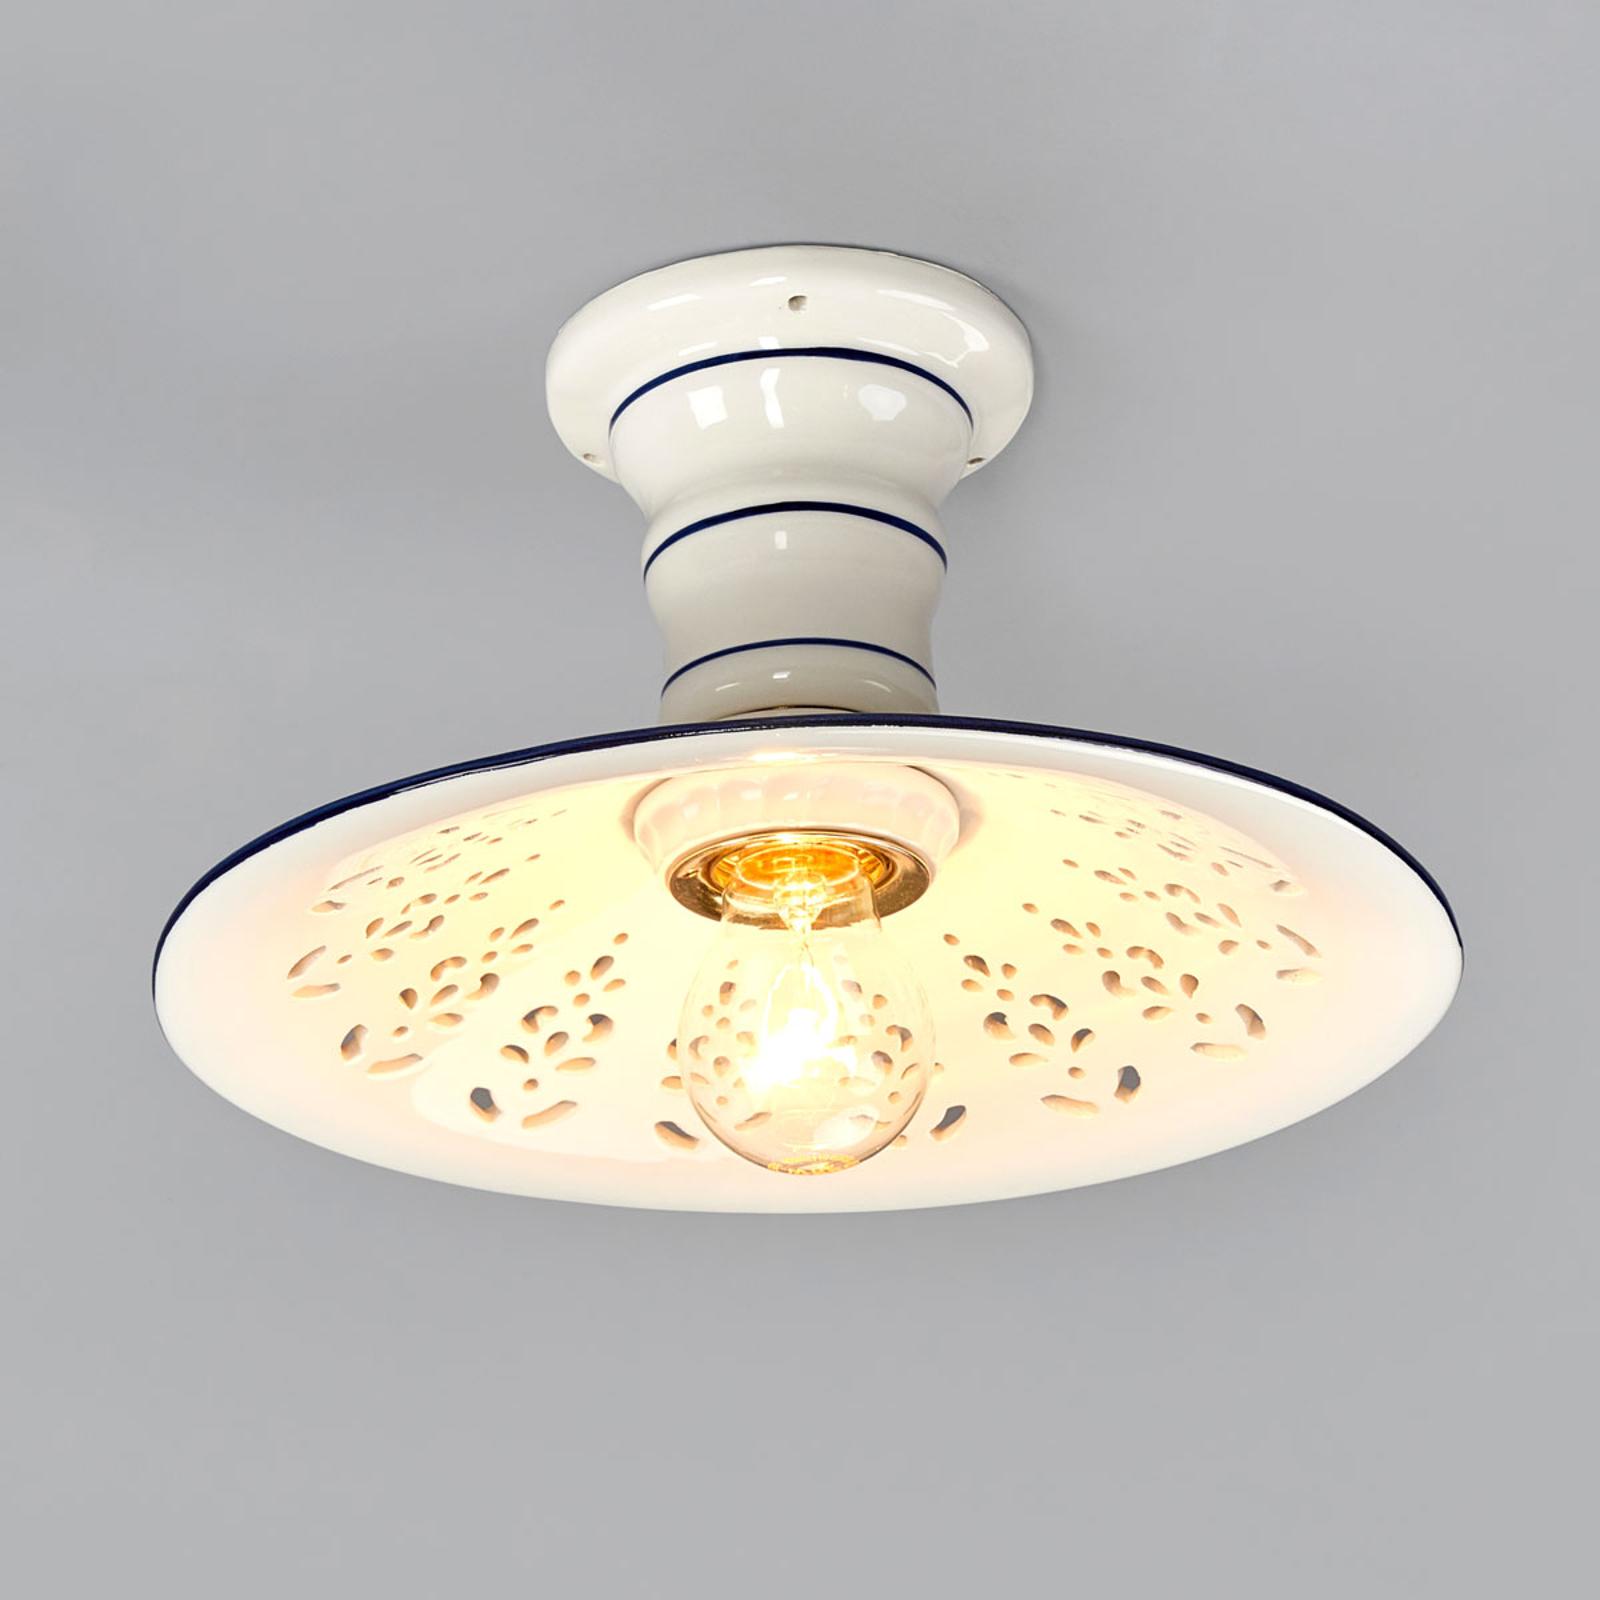 Charmante plafondlamp AMENO